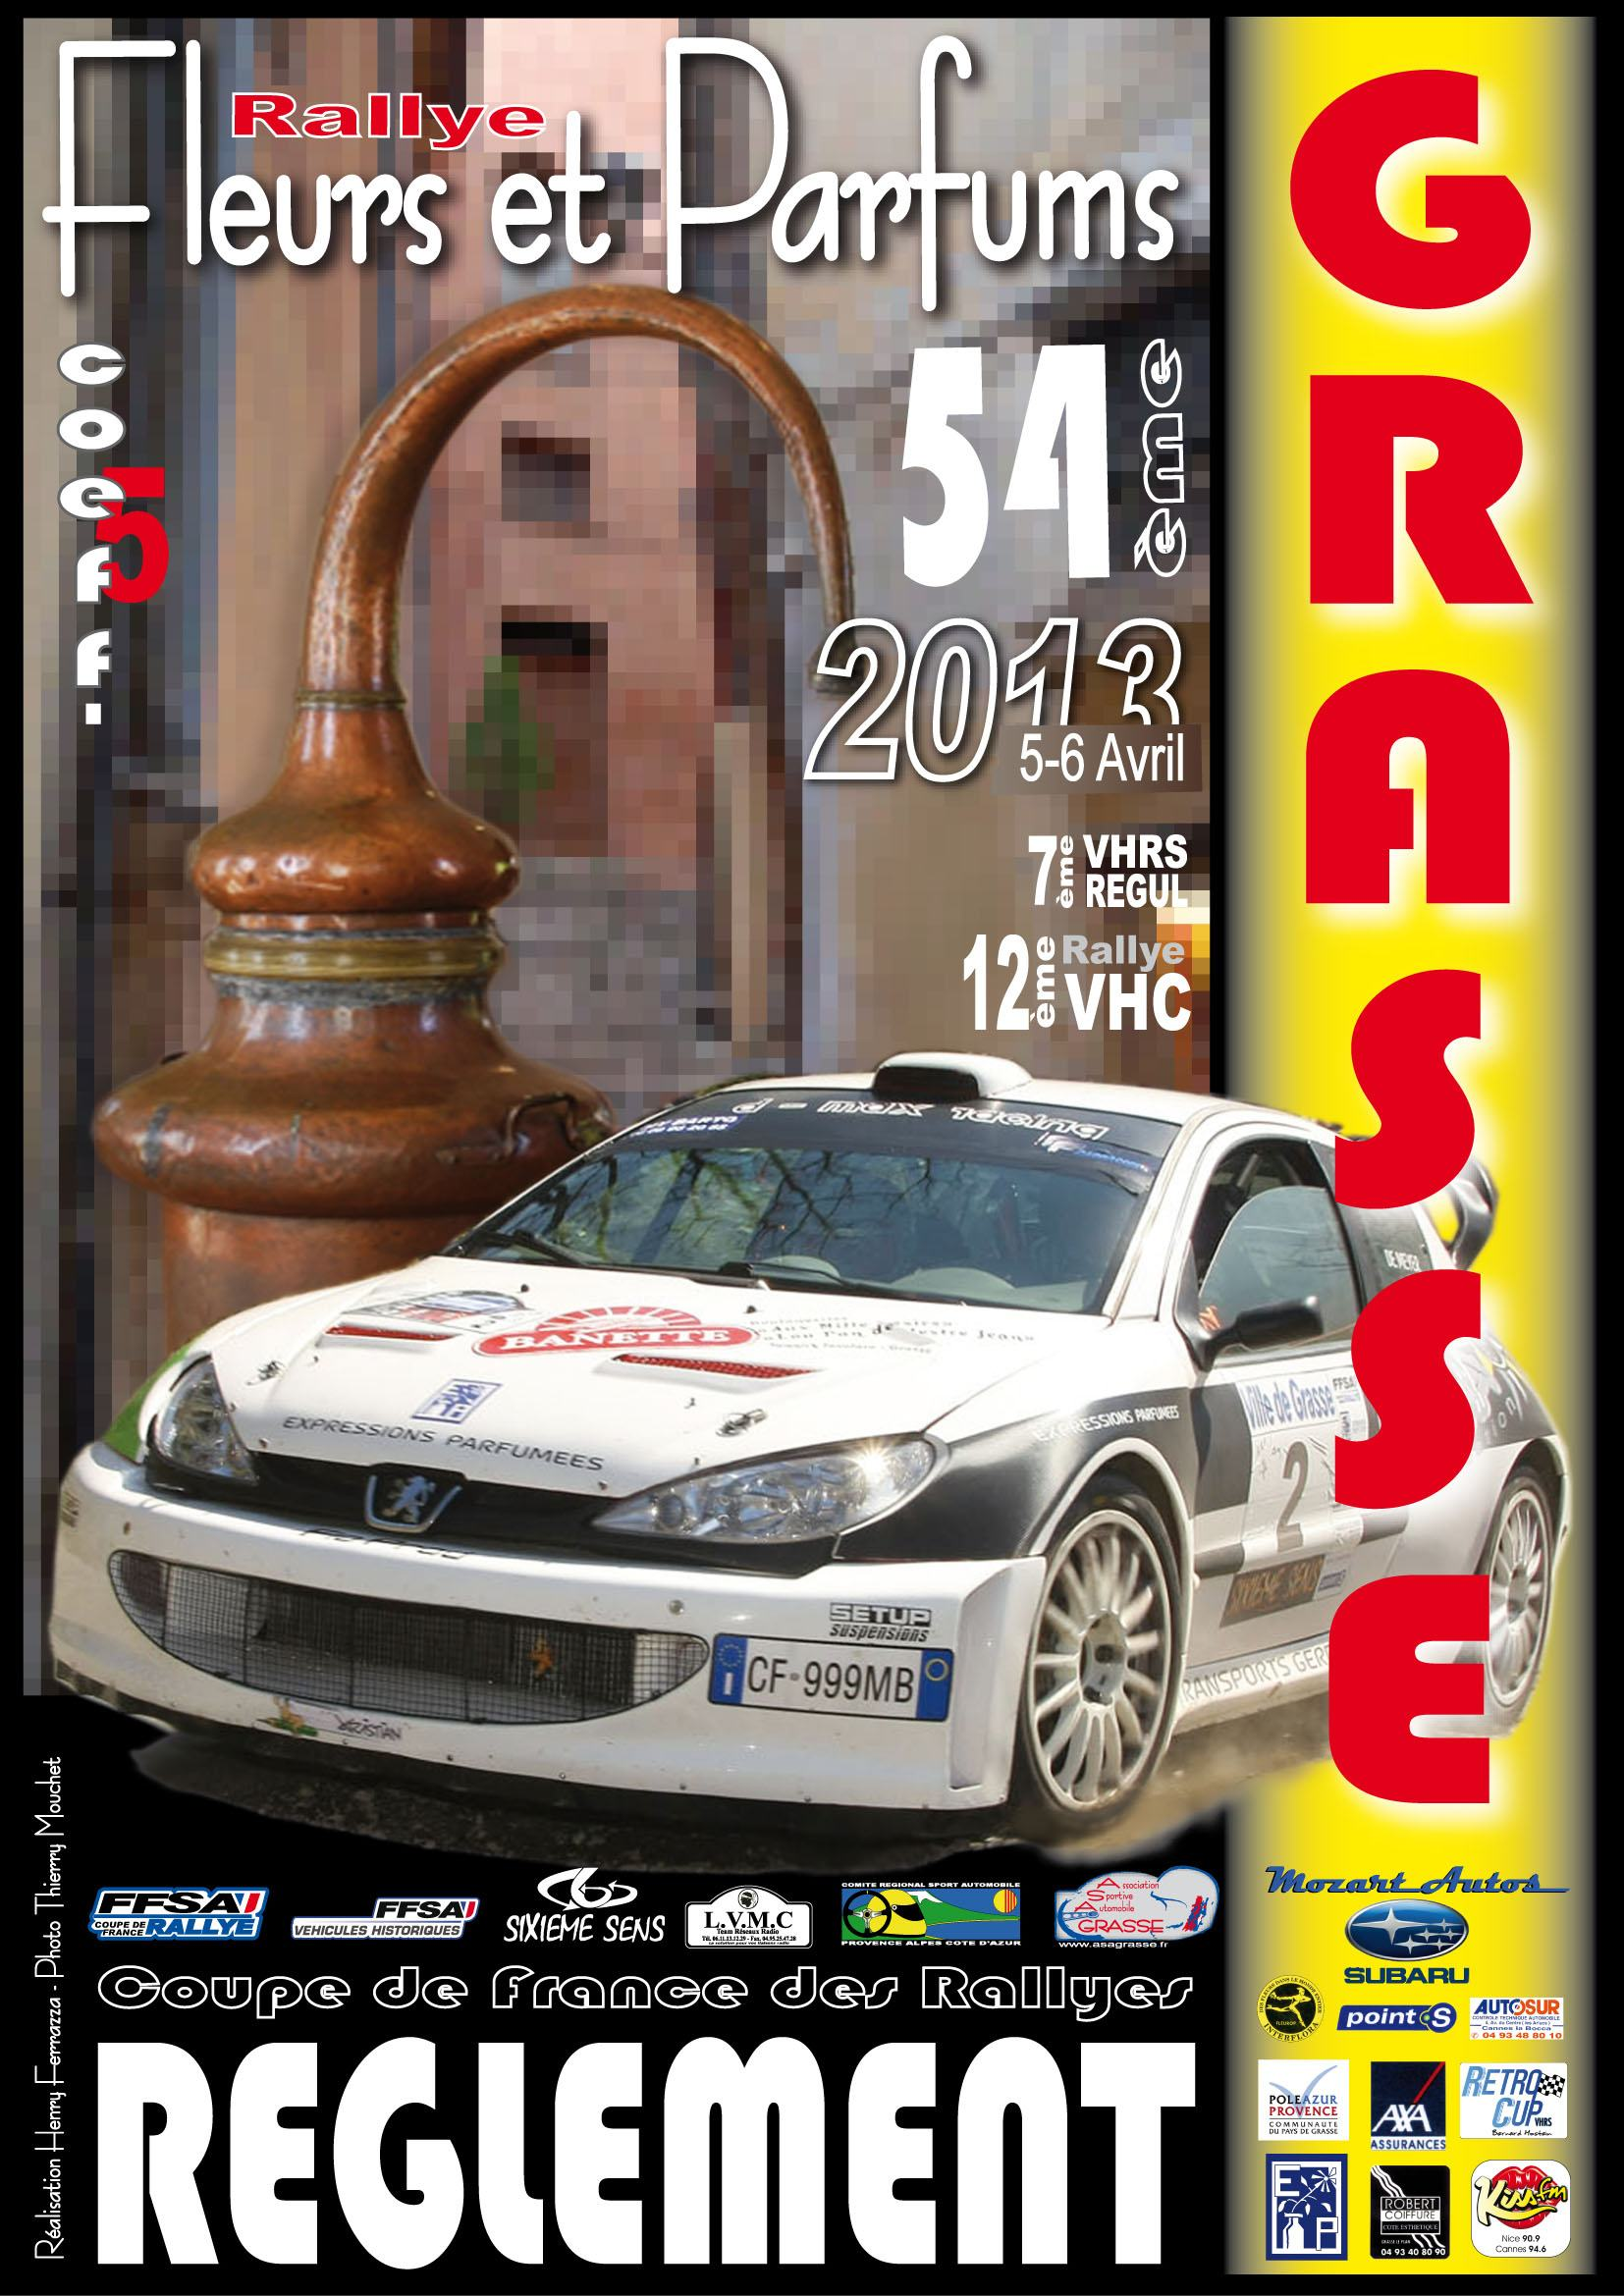 Rallye-Grasse-Fleurs-et-Parfums-2013